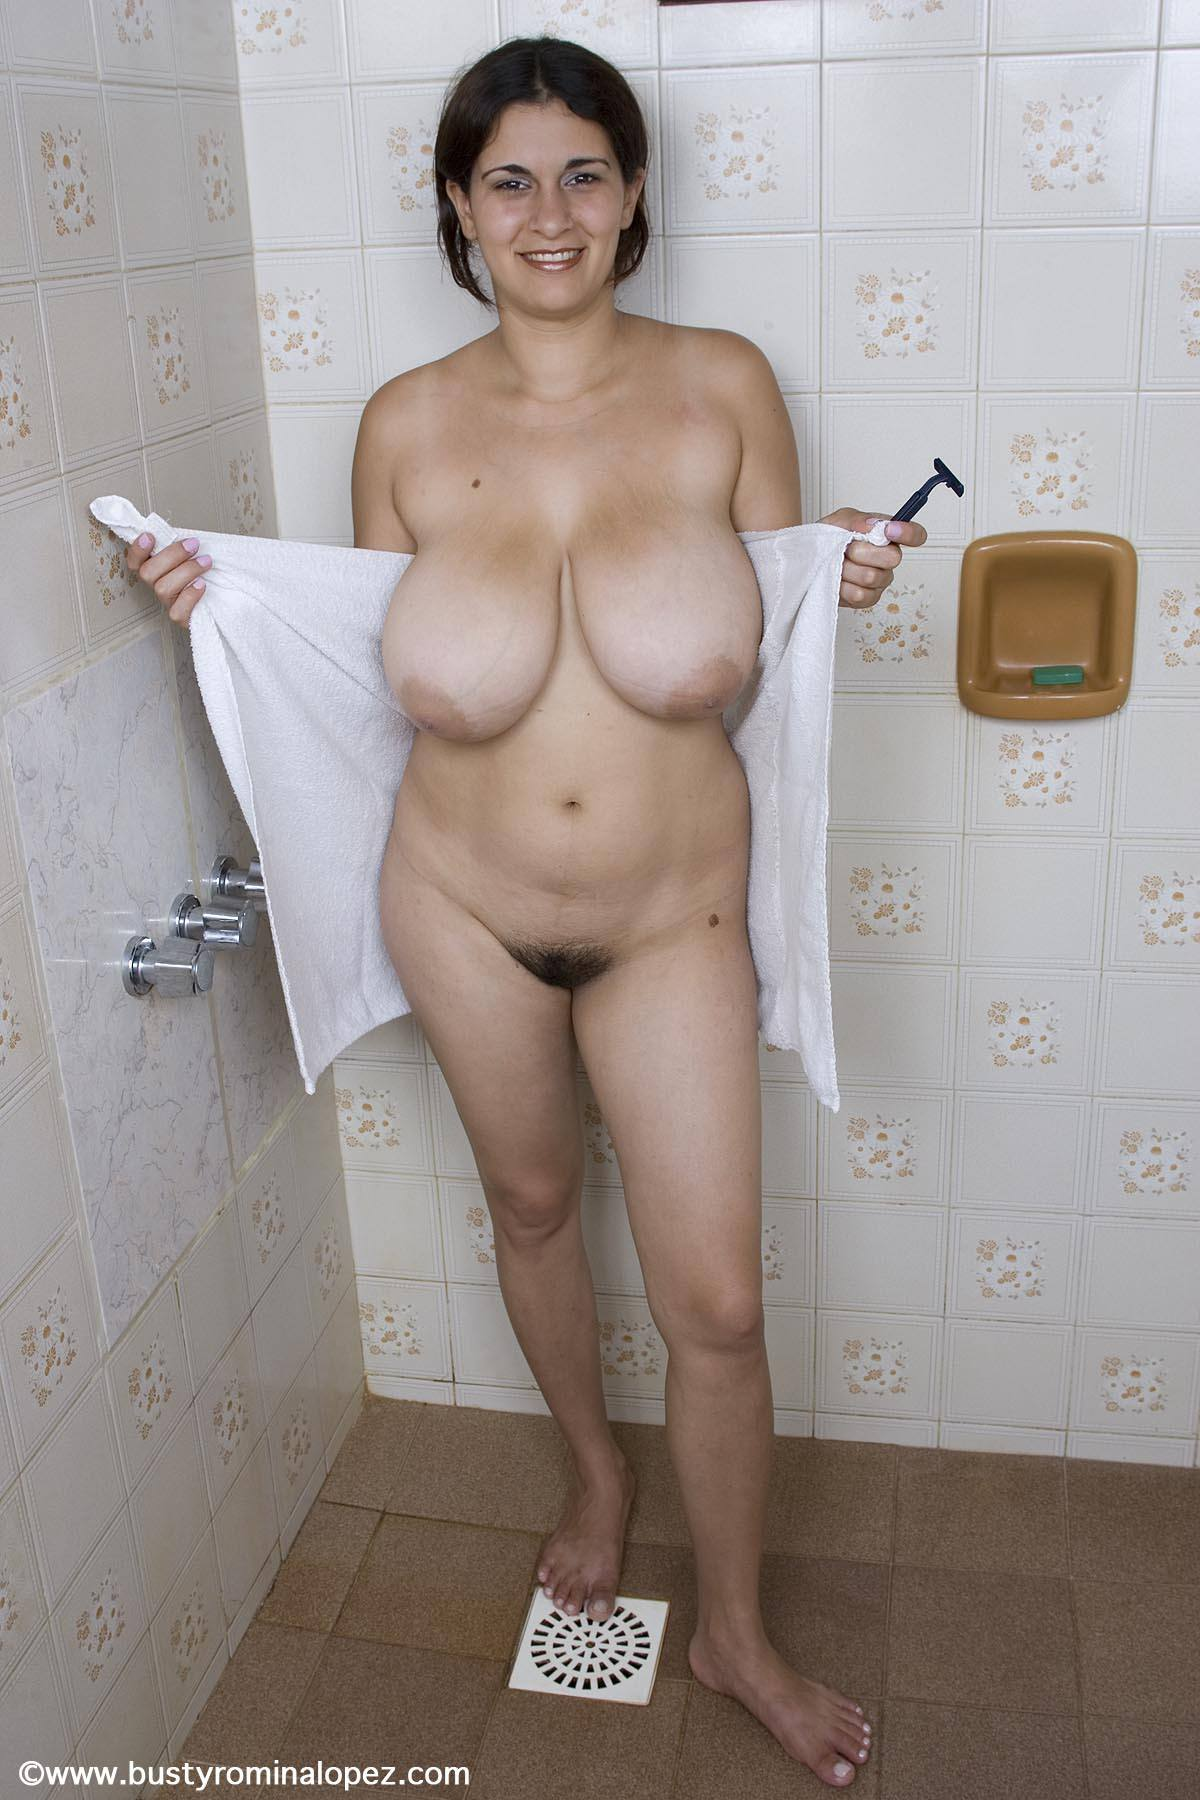 big latina tits shower - Big fat naked girls in shower blacks. Best Porno site ...